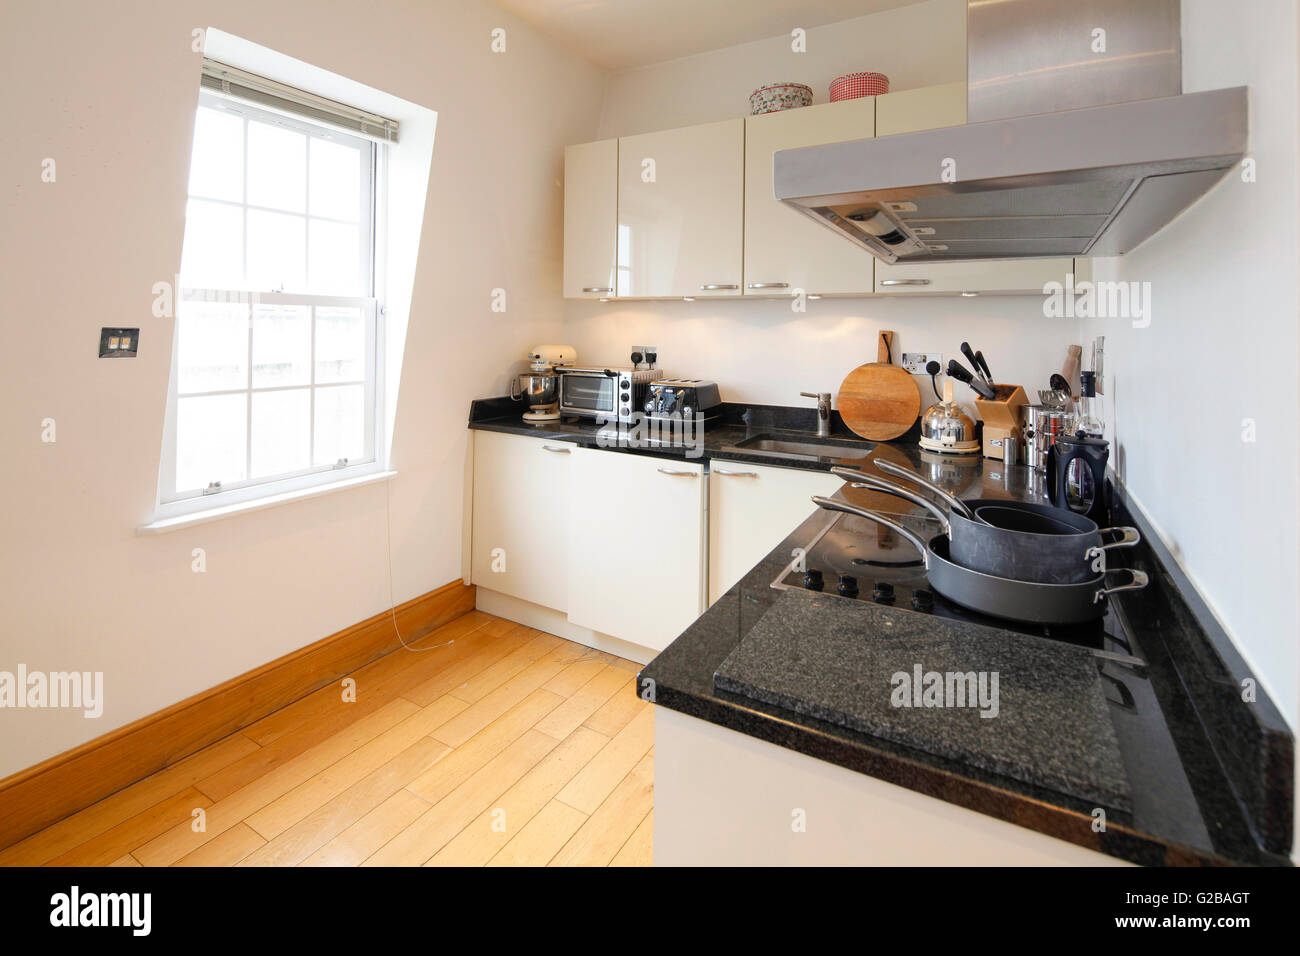 Kitchen Wood Flooring Stockfotos & Kitchen Wood Flooring Bilder - Alamy